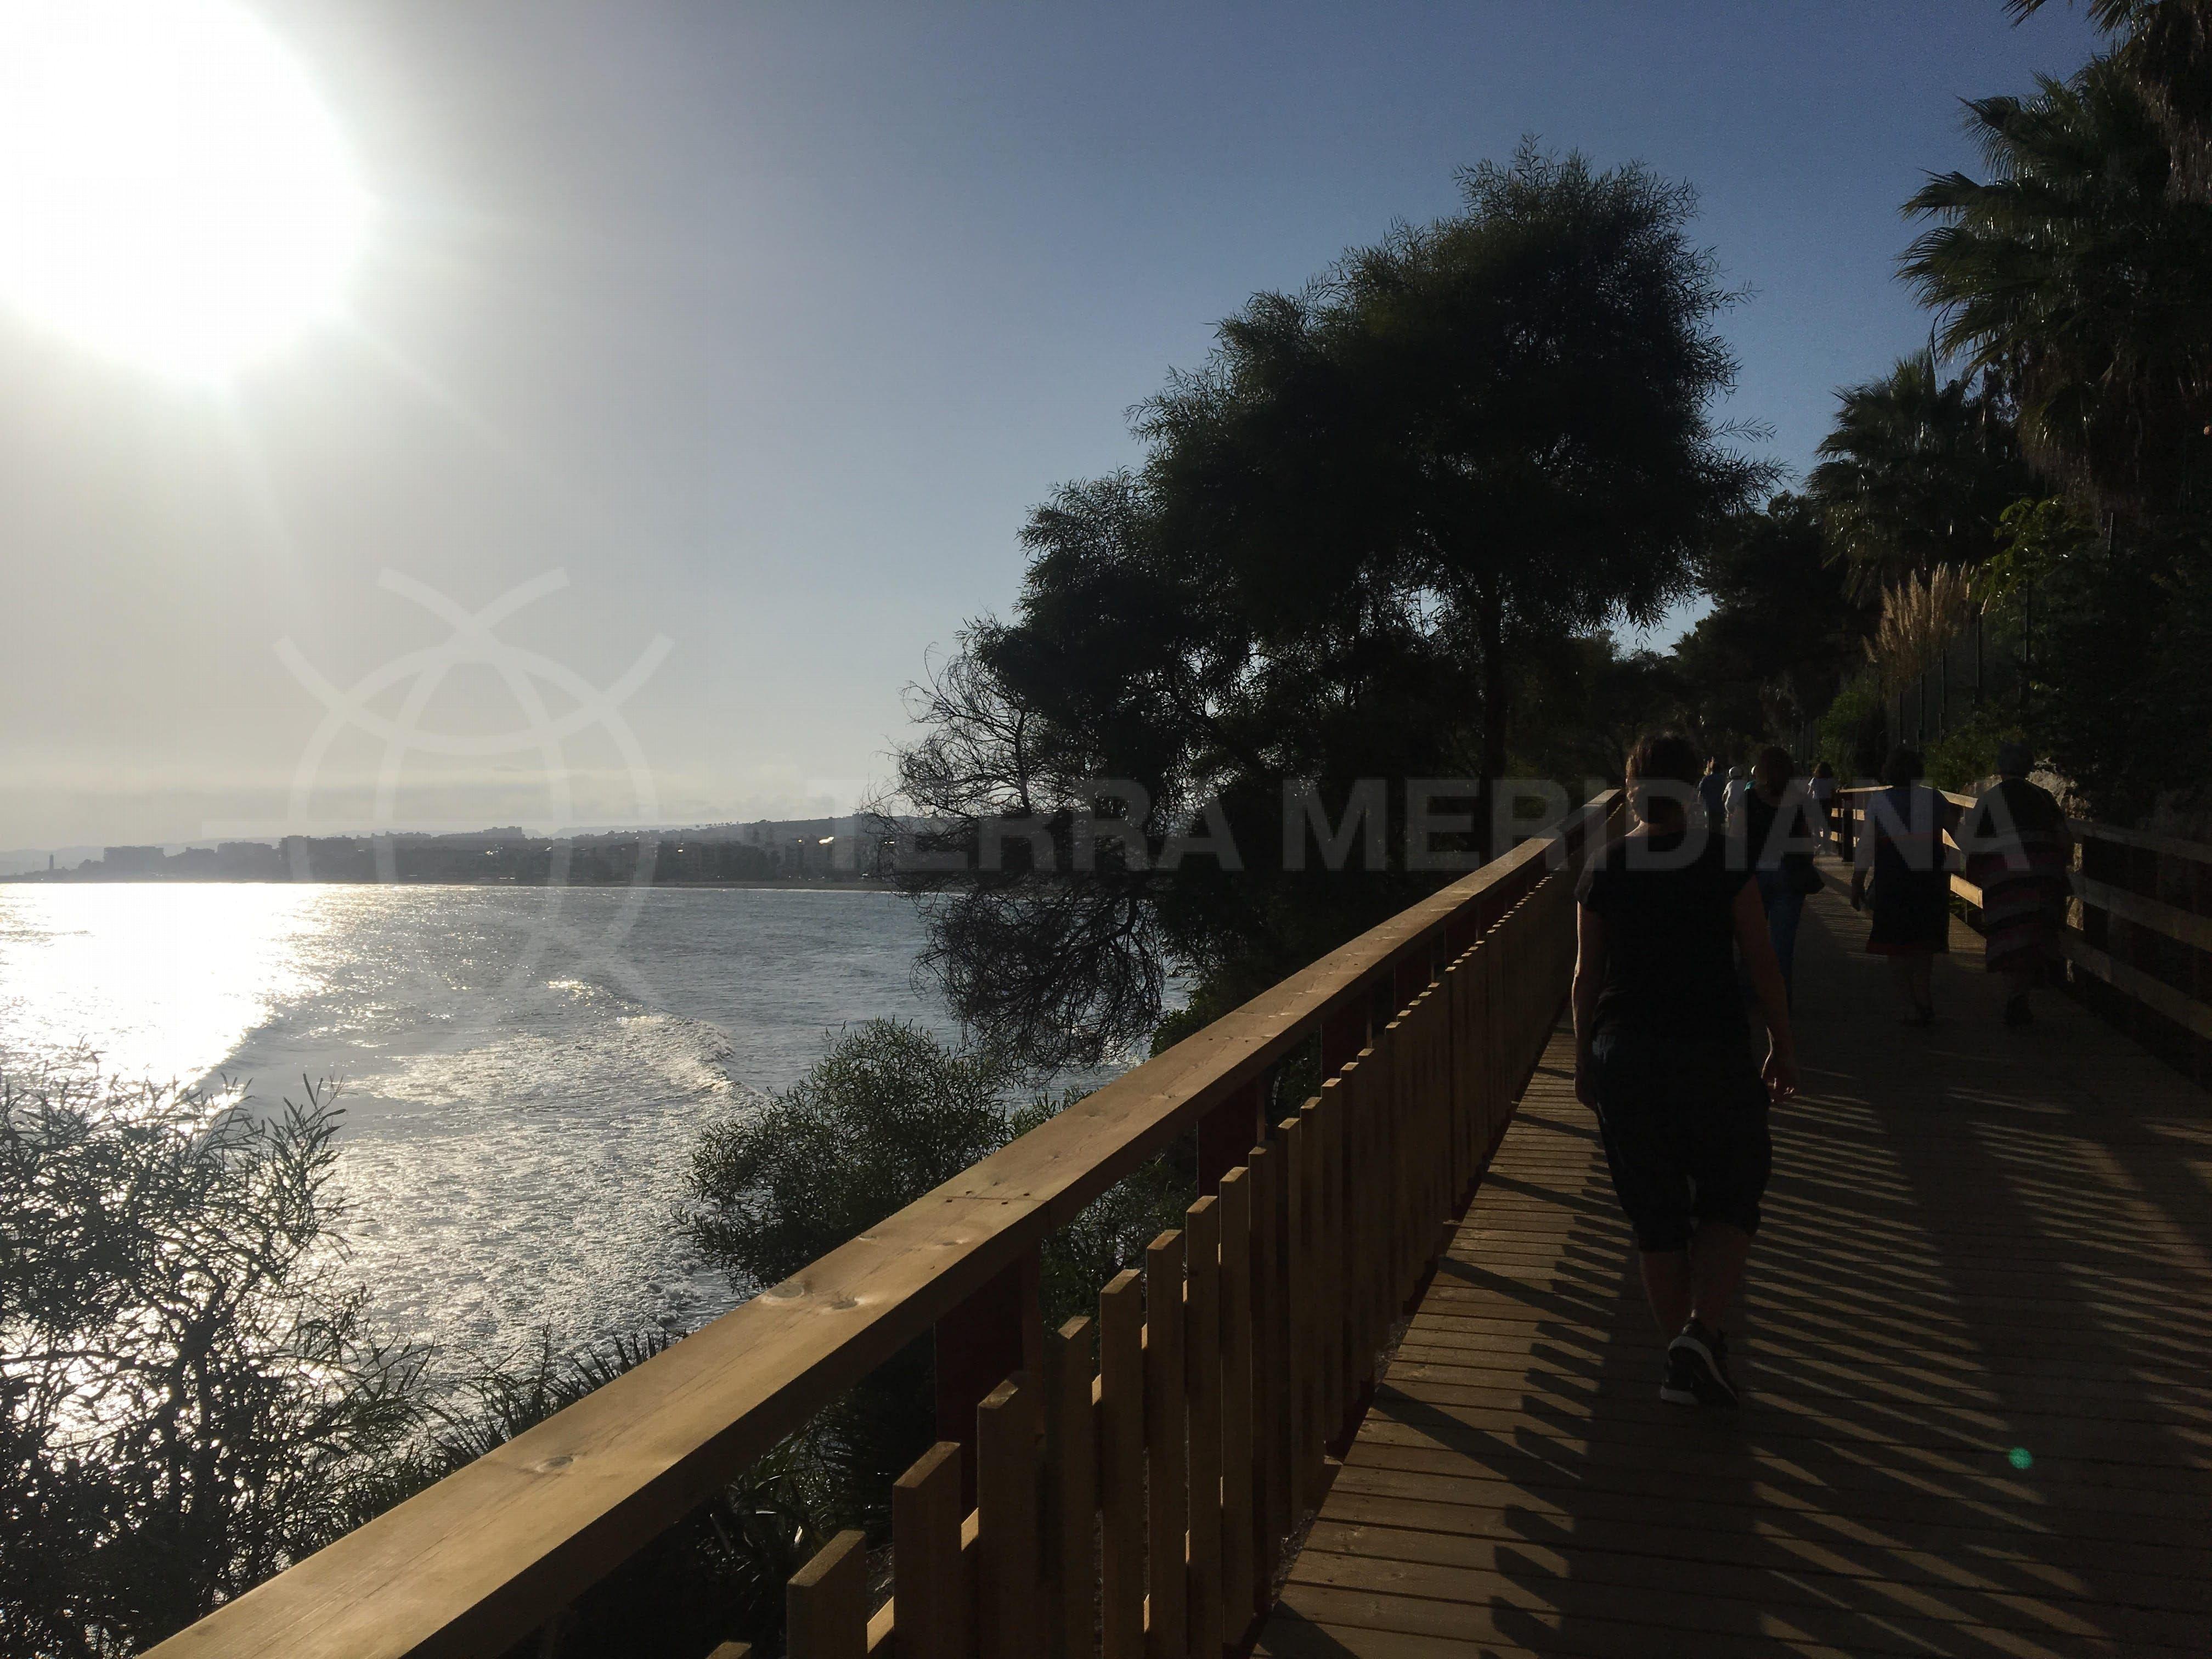 Costa del Sol coastal path continues expansion